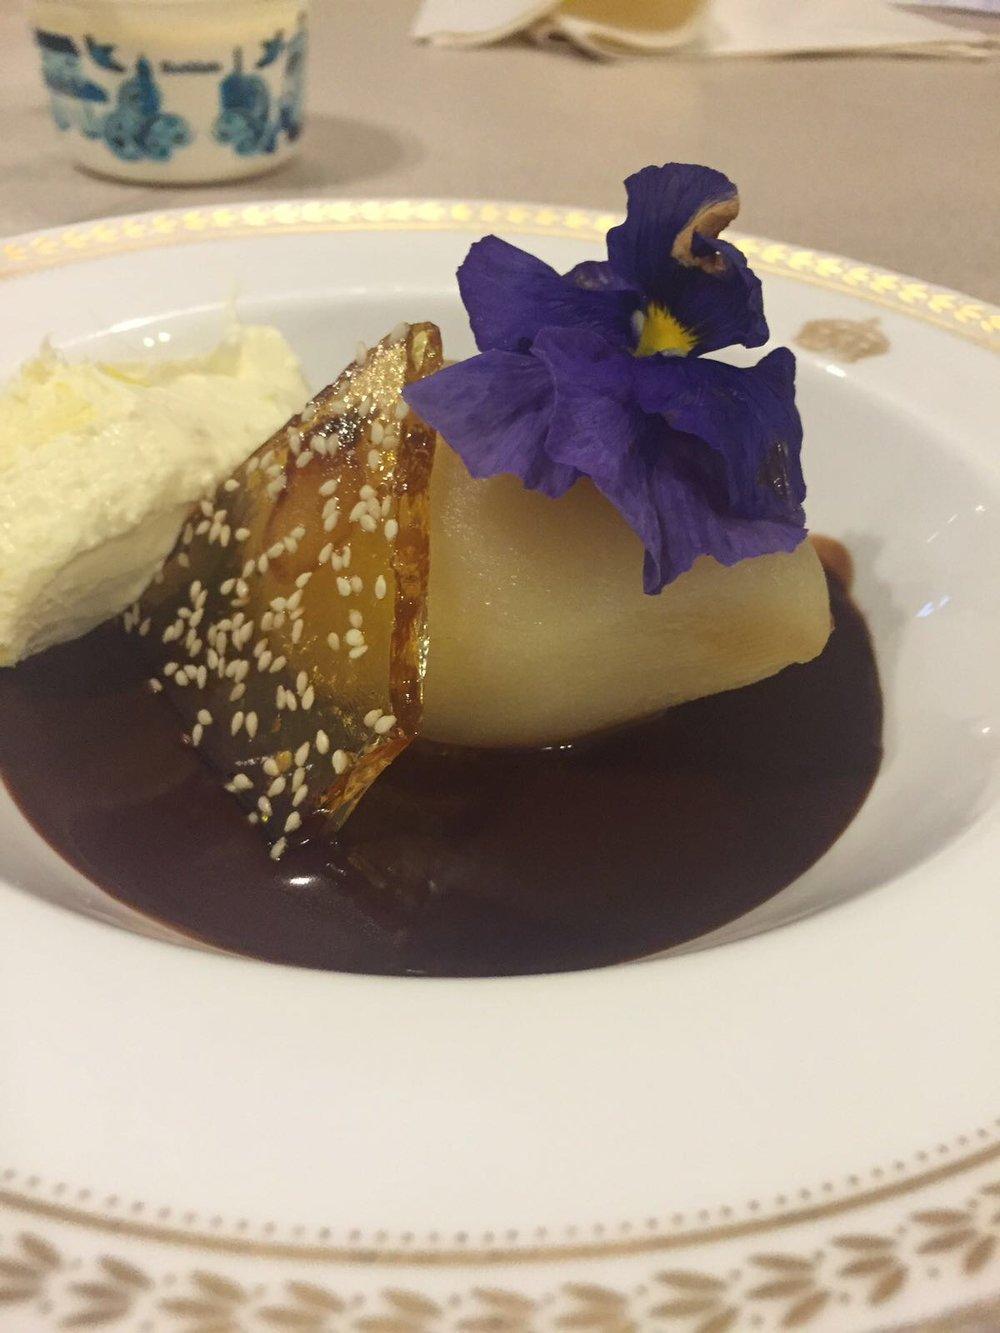 puddings-sarah-symington-catering-11.JPG